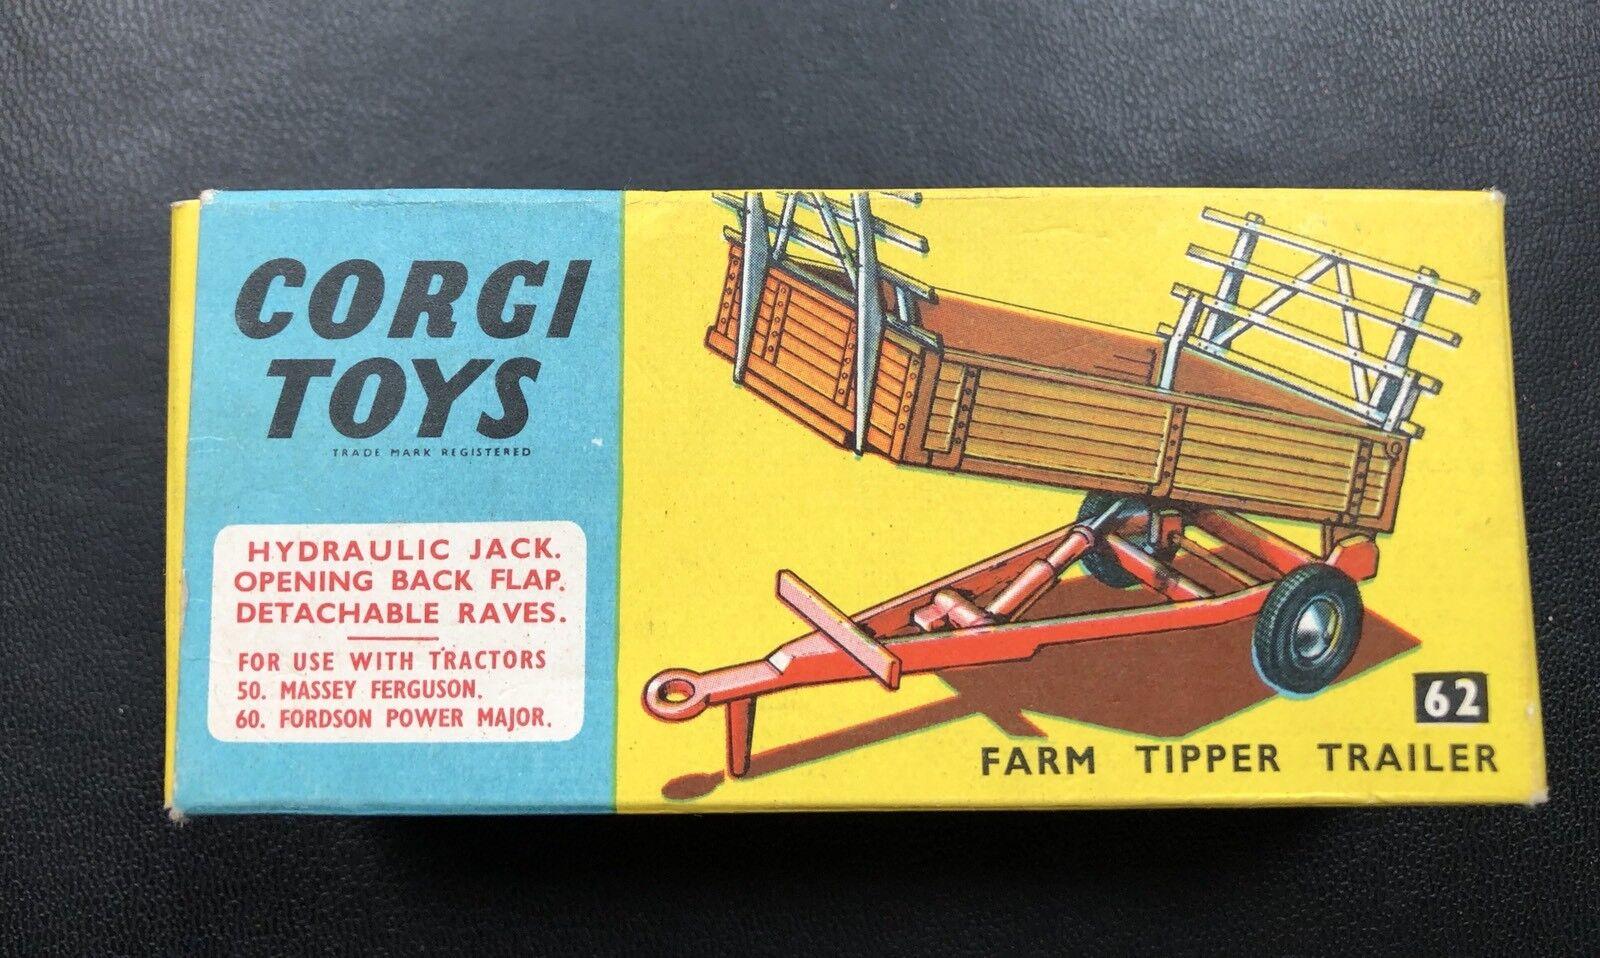 Corgi 62 farm tipper wohnwagen geboxt